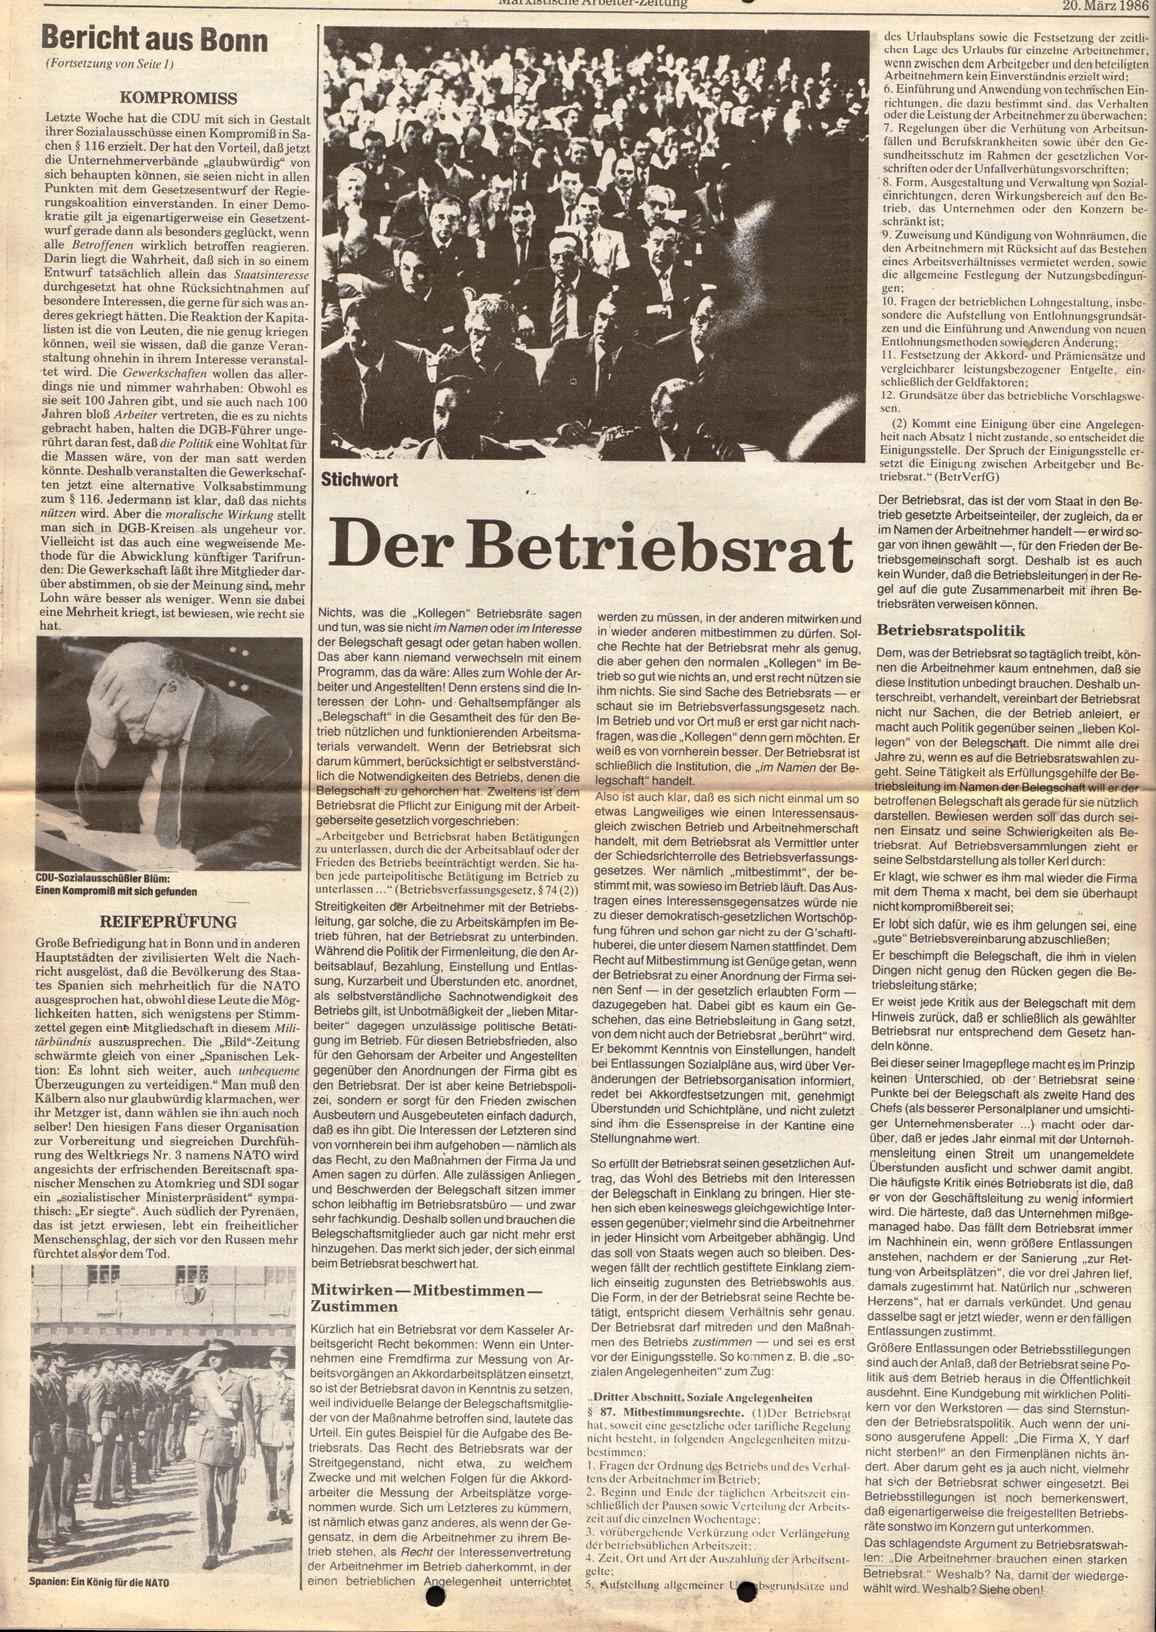 Muenchen_MG_MAZ_AGFA_19860320_02